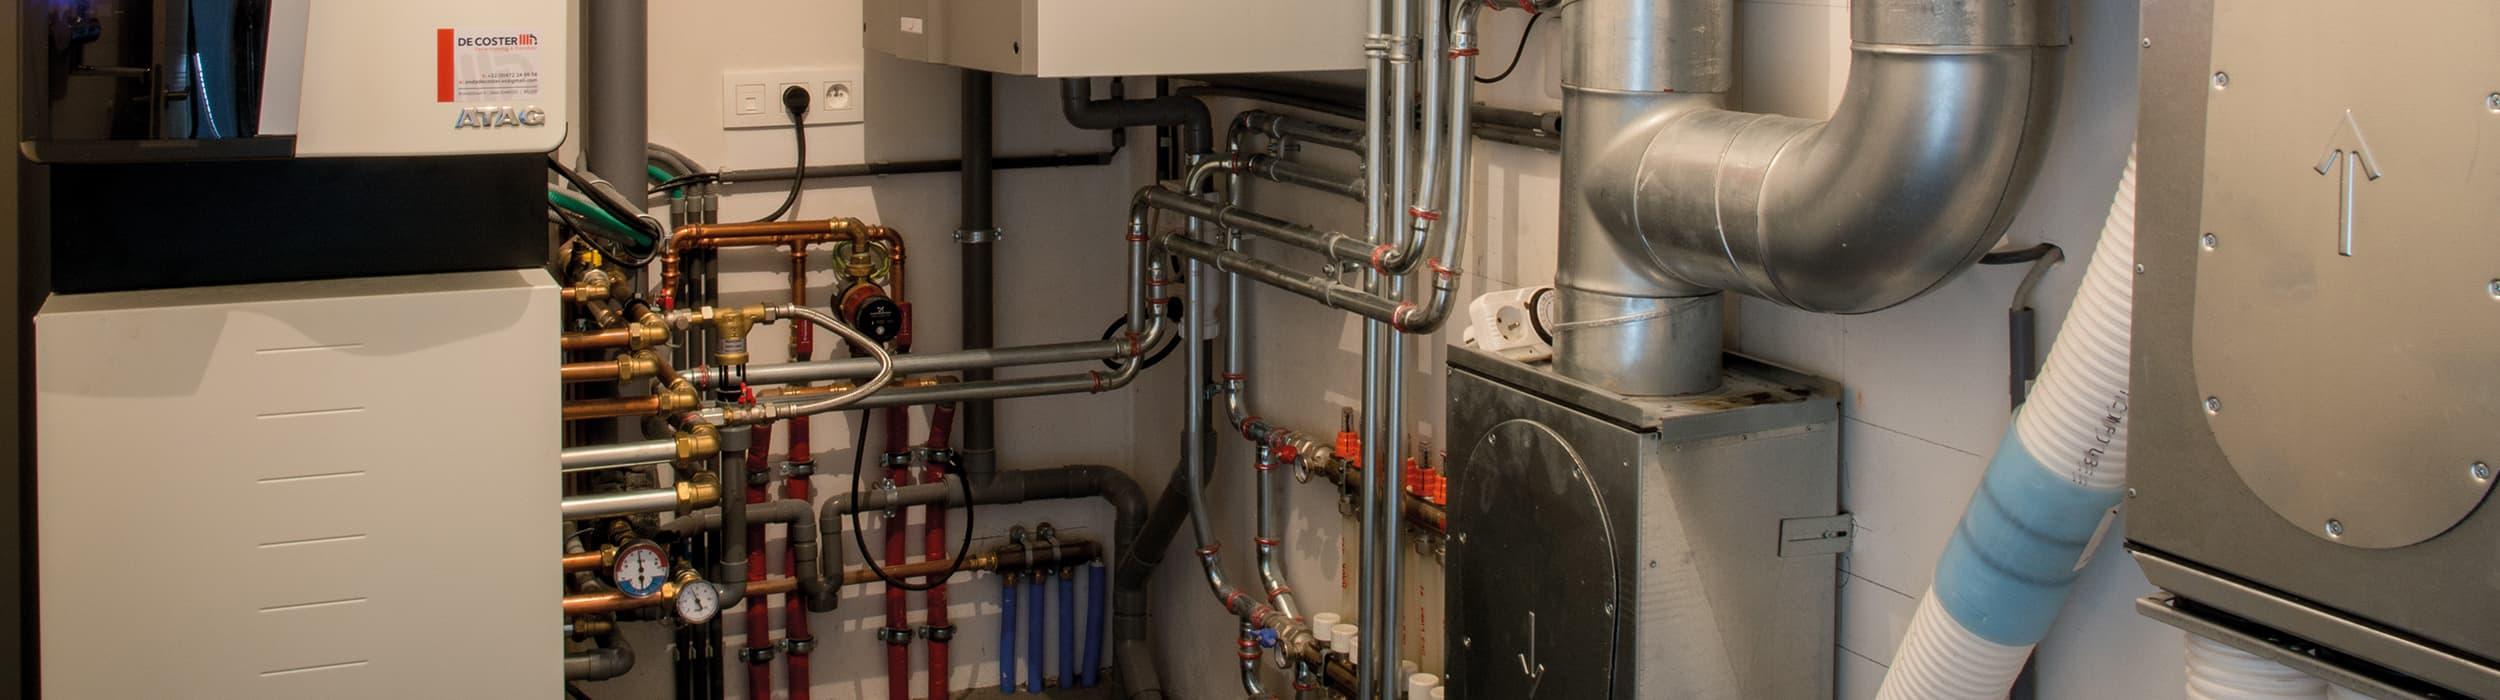 Verwarming, sanitair en Ventilatie van DeCoster Kinrooi